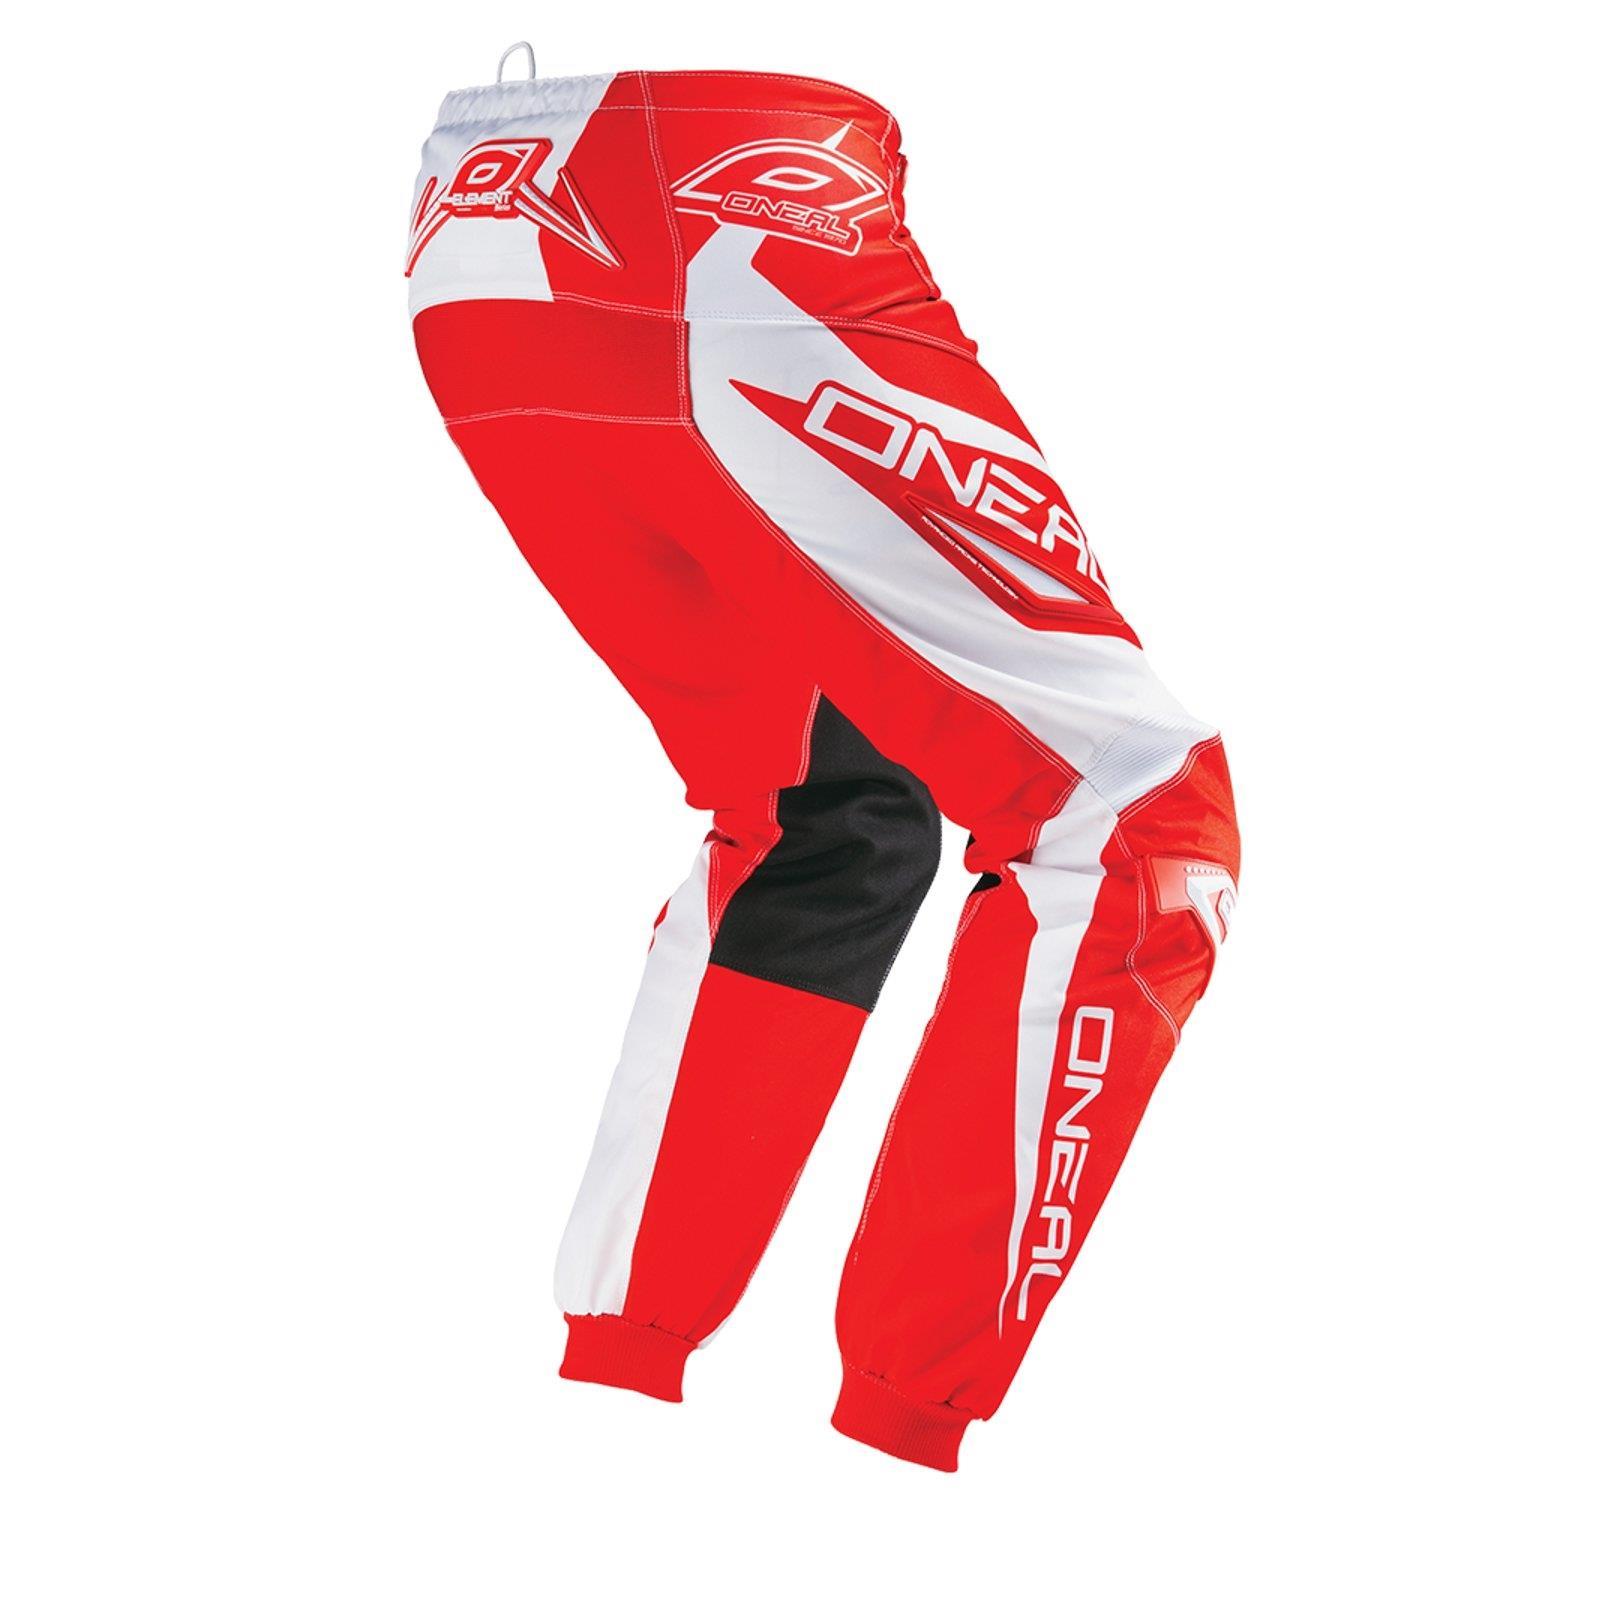 ONeal-pantalones-de-Jersey-de-los-ninos-de-pantalones-cortos-ninos-MX-bicicleta-DH-montana-bicicleta miniatura 57